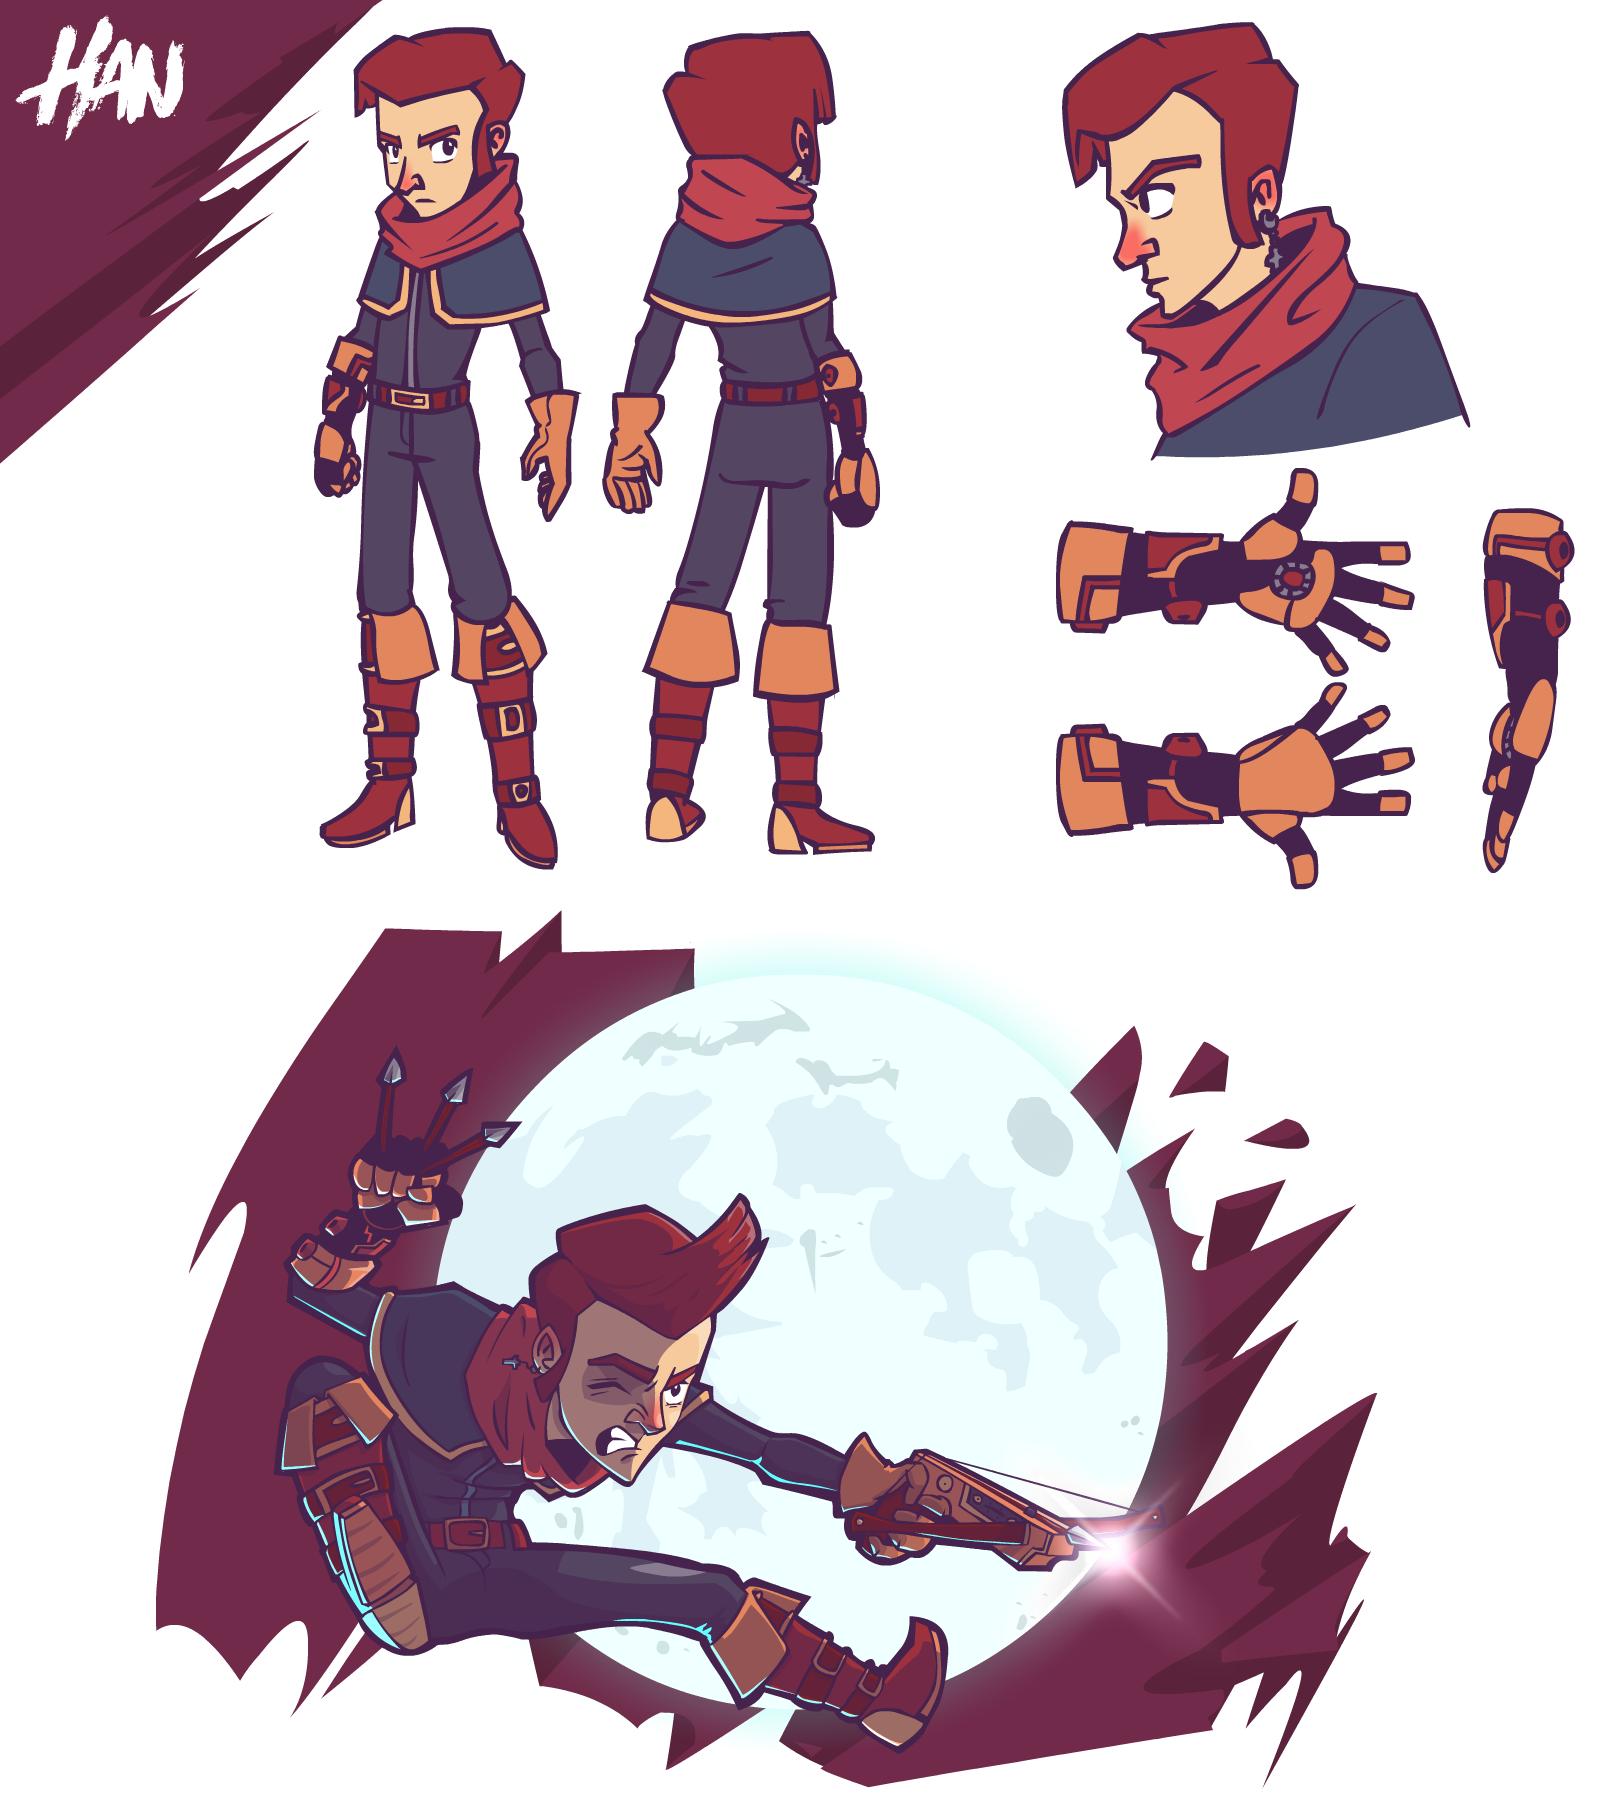 Han character design